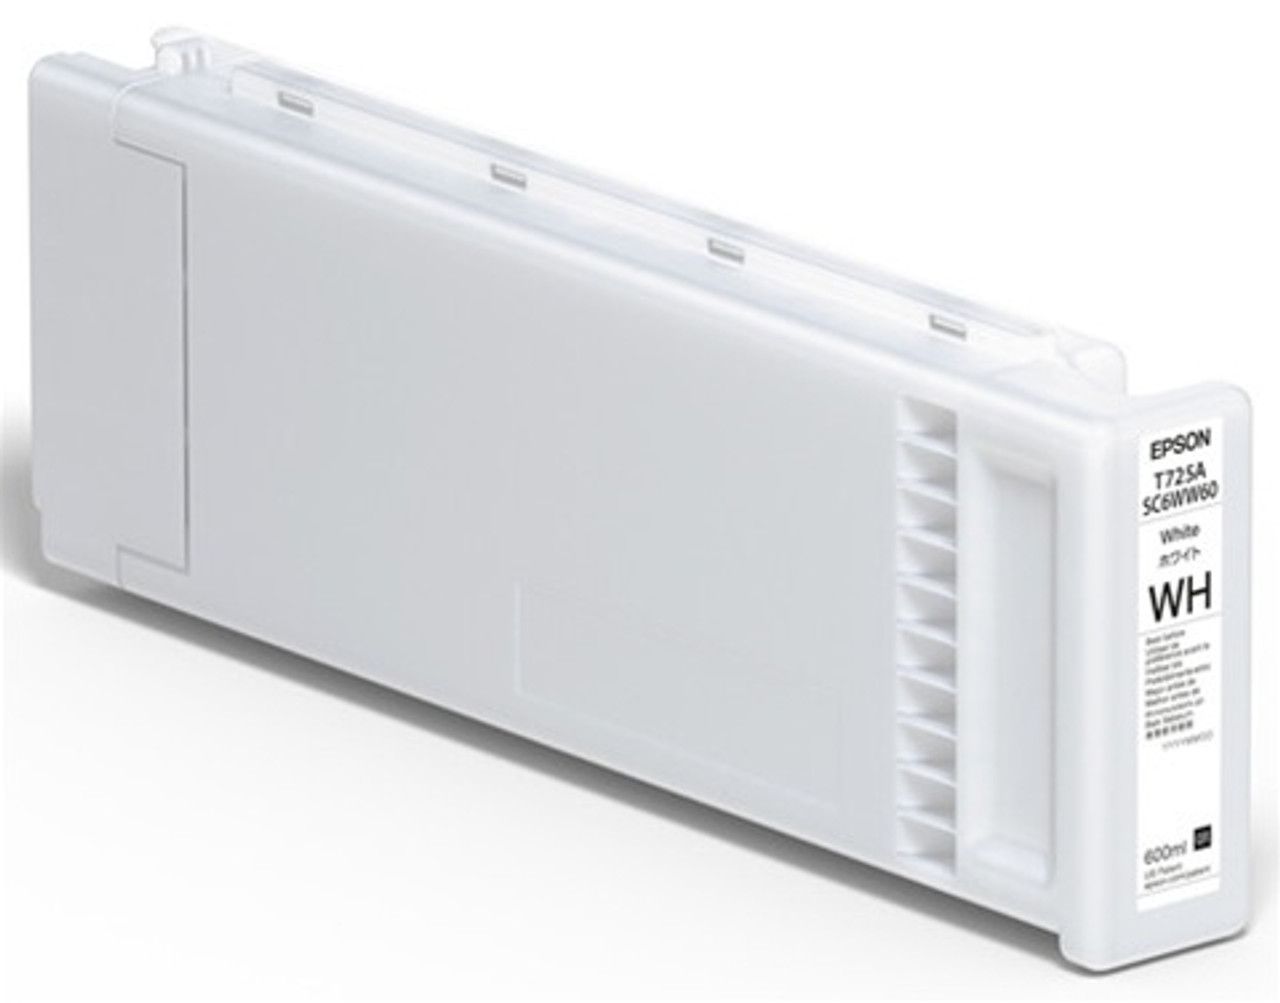 Epson F2100/F2000 Ink Cartridge, WHITE 600ML